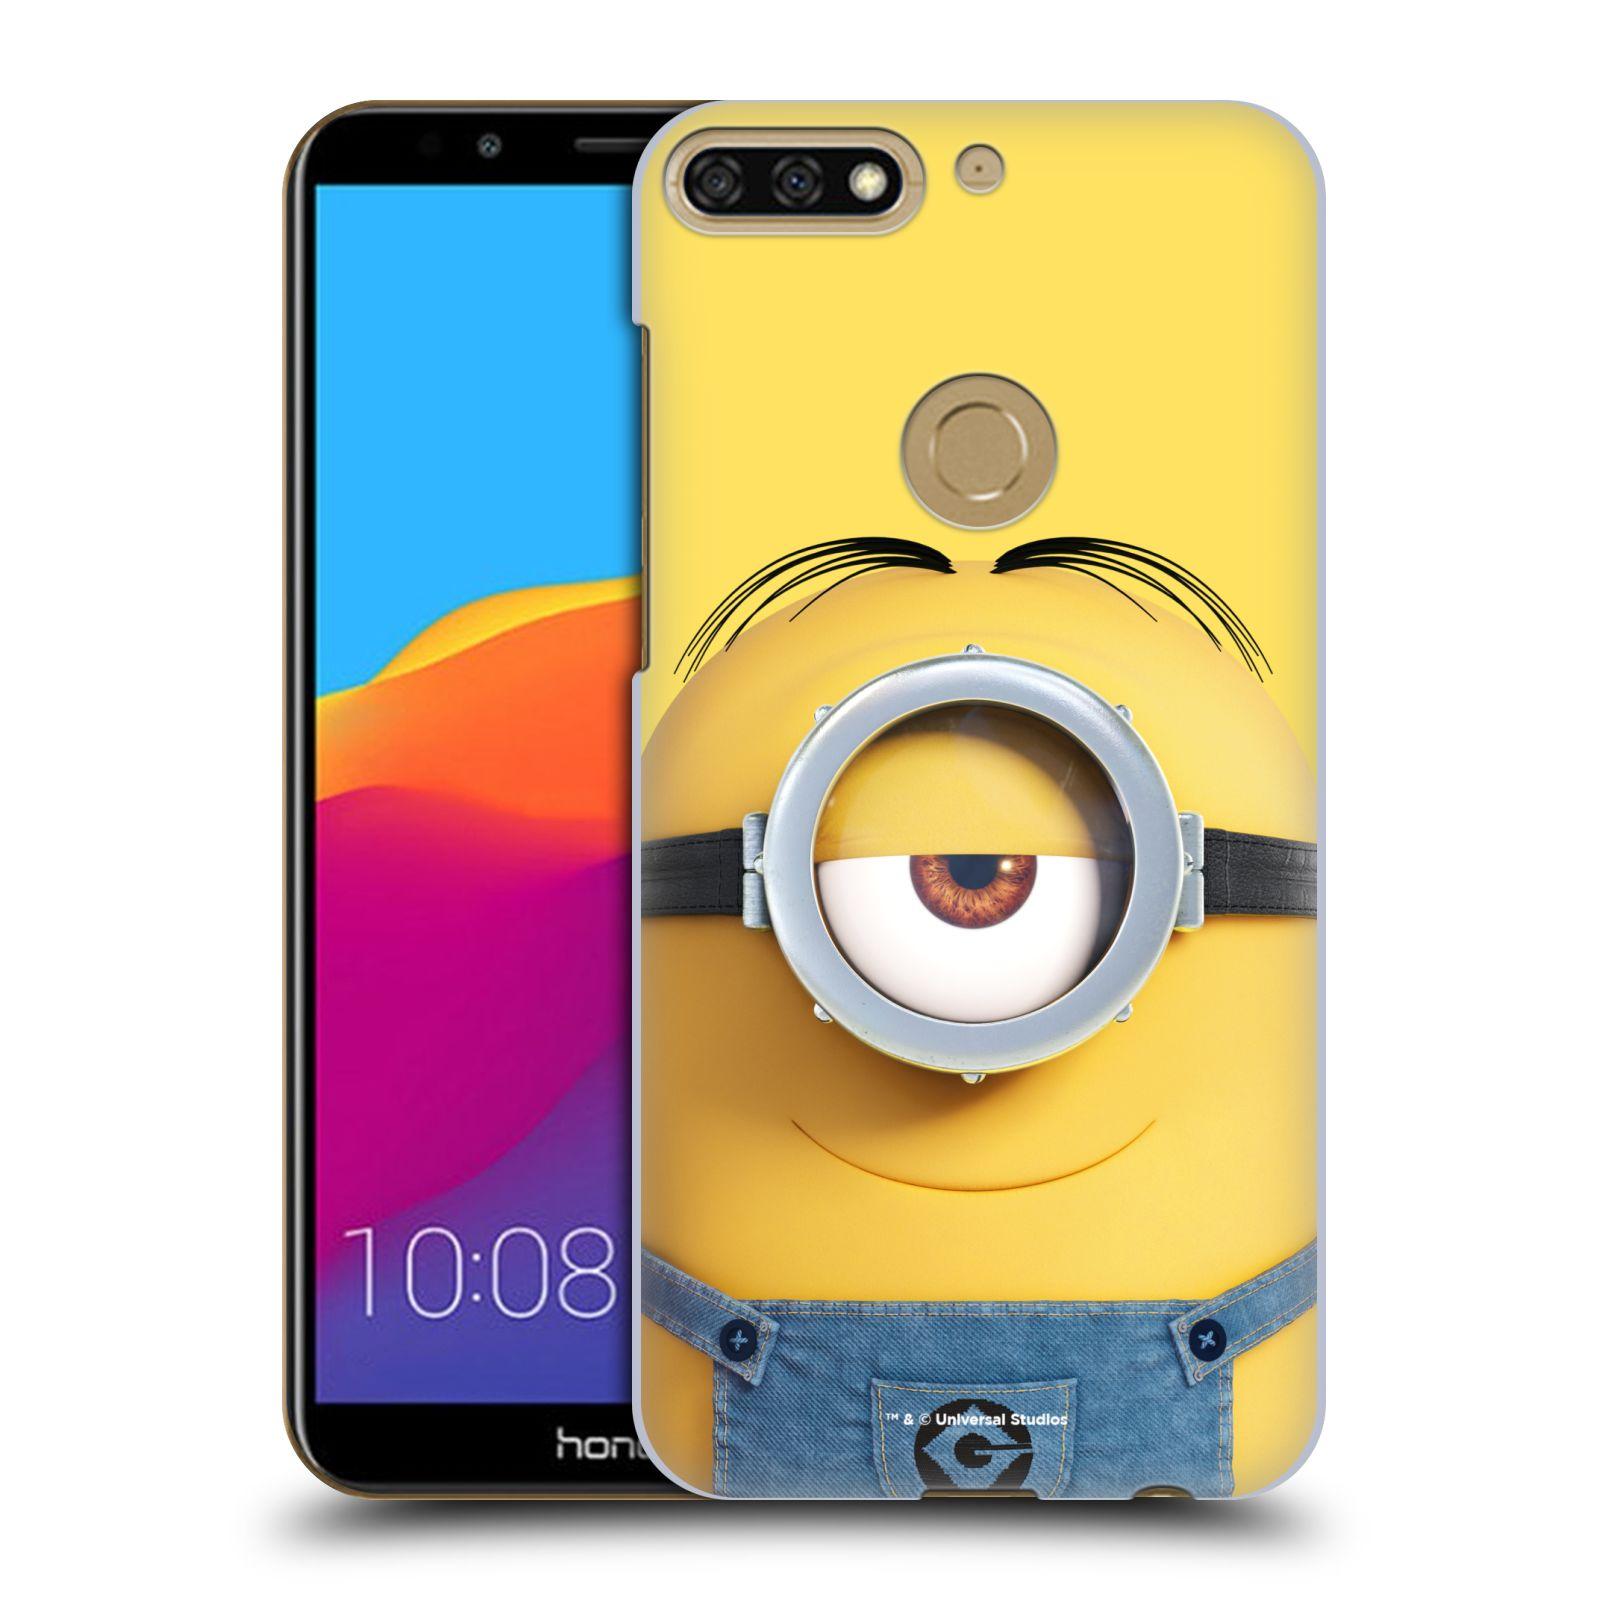 Plastové pouzdro na mobil Huawei Y7 Prime 2018 - Head Case - Mimoň Stuart z filmu Já, padouch - Despicable Me